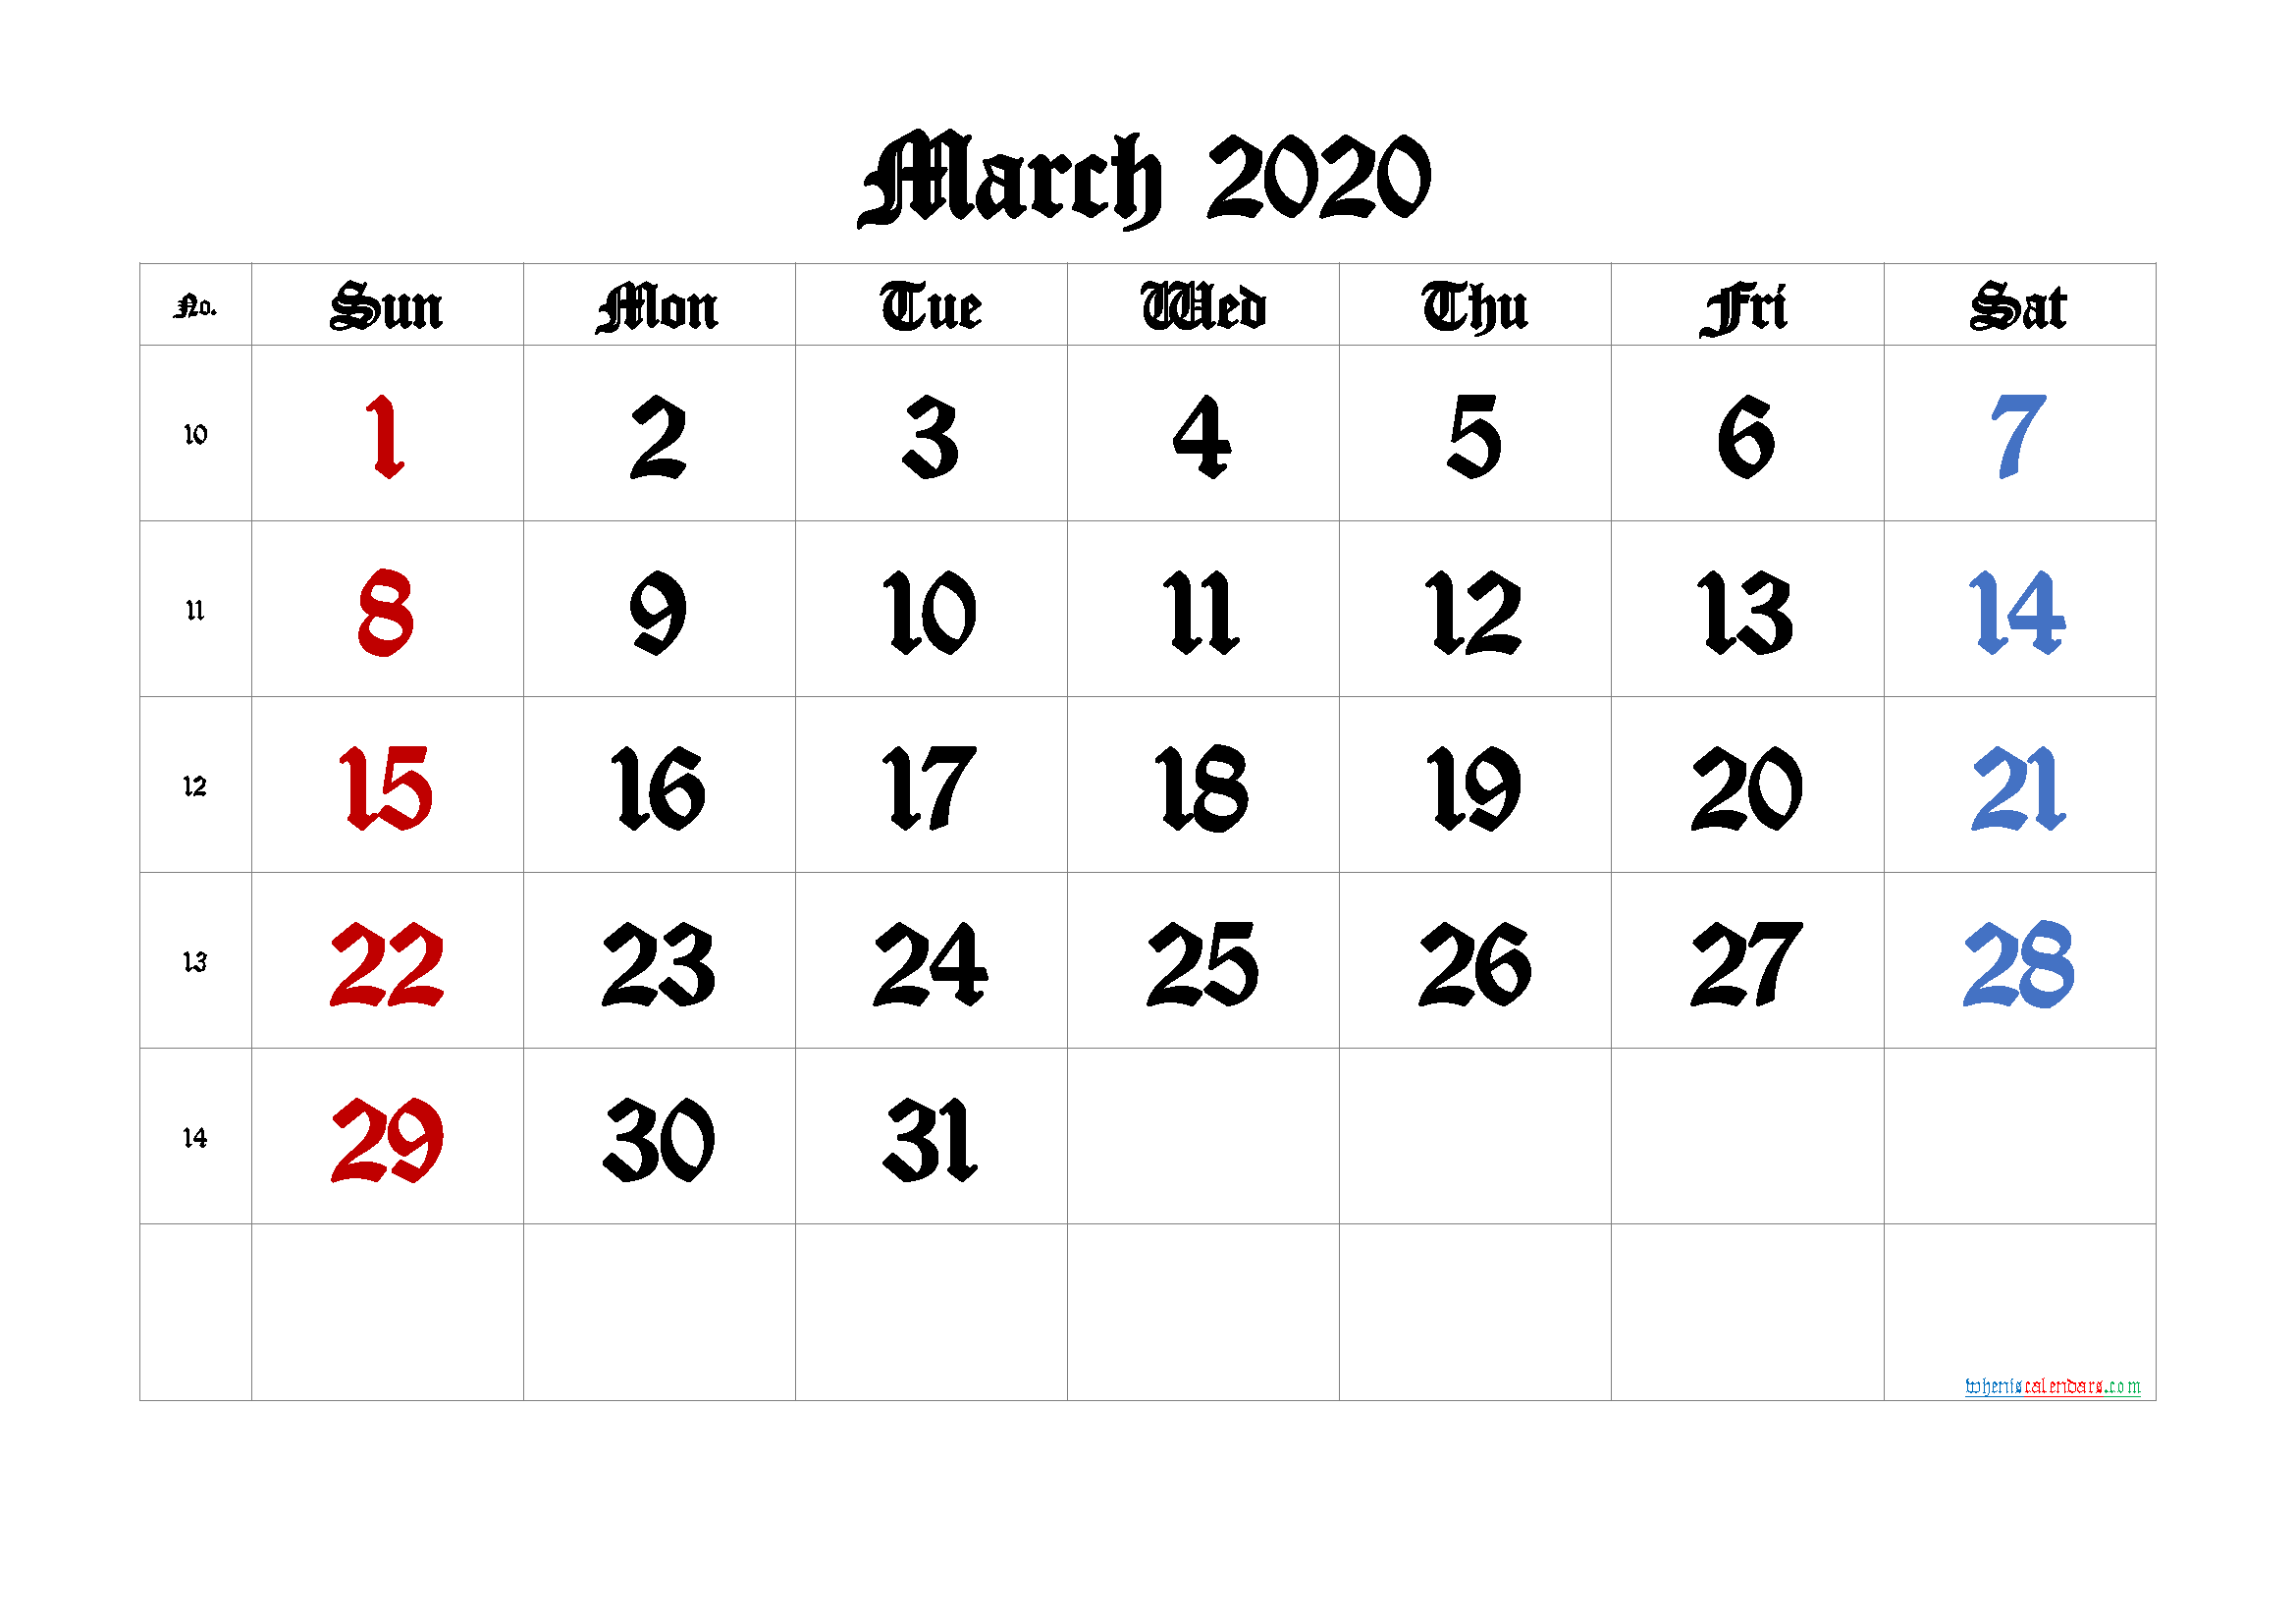 March 2020 Printable Calendar with Week Numbers